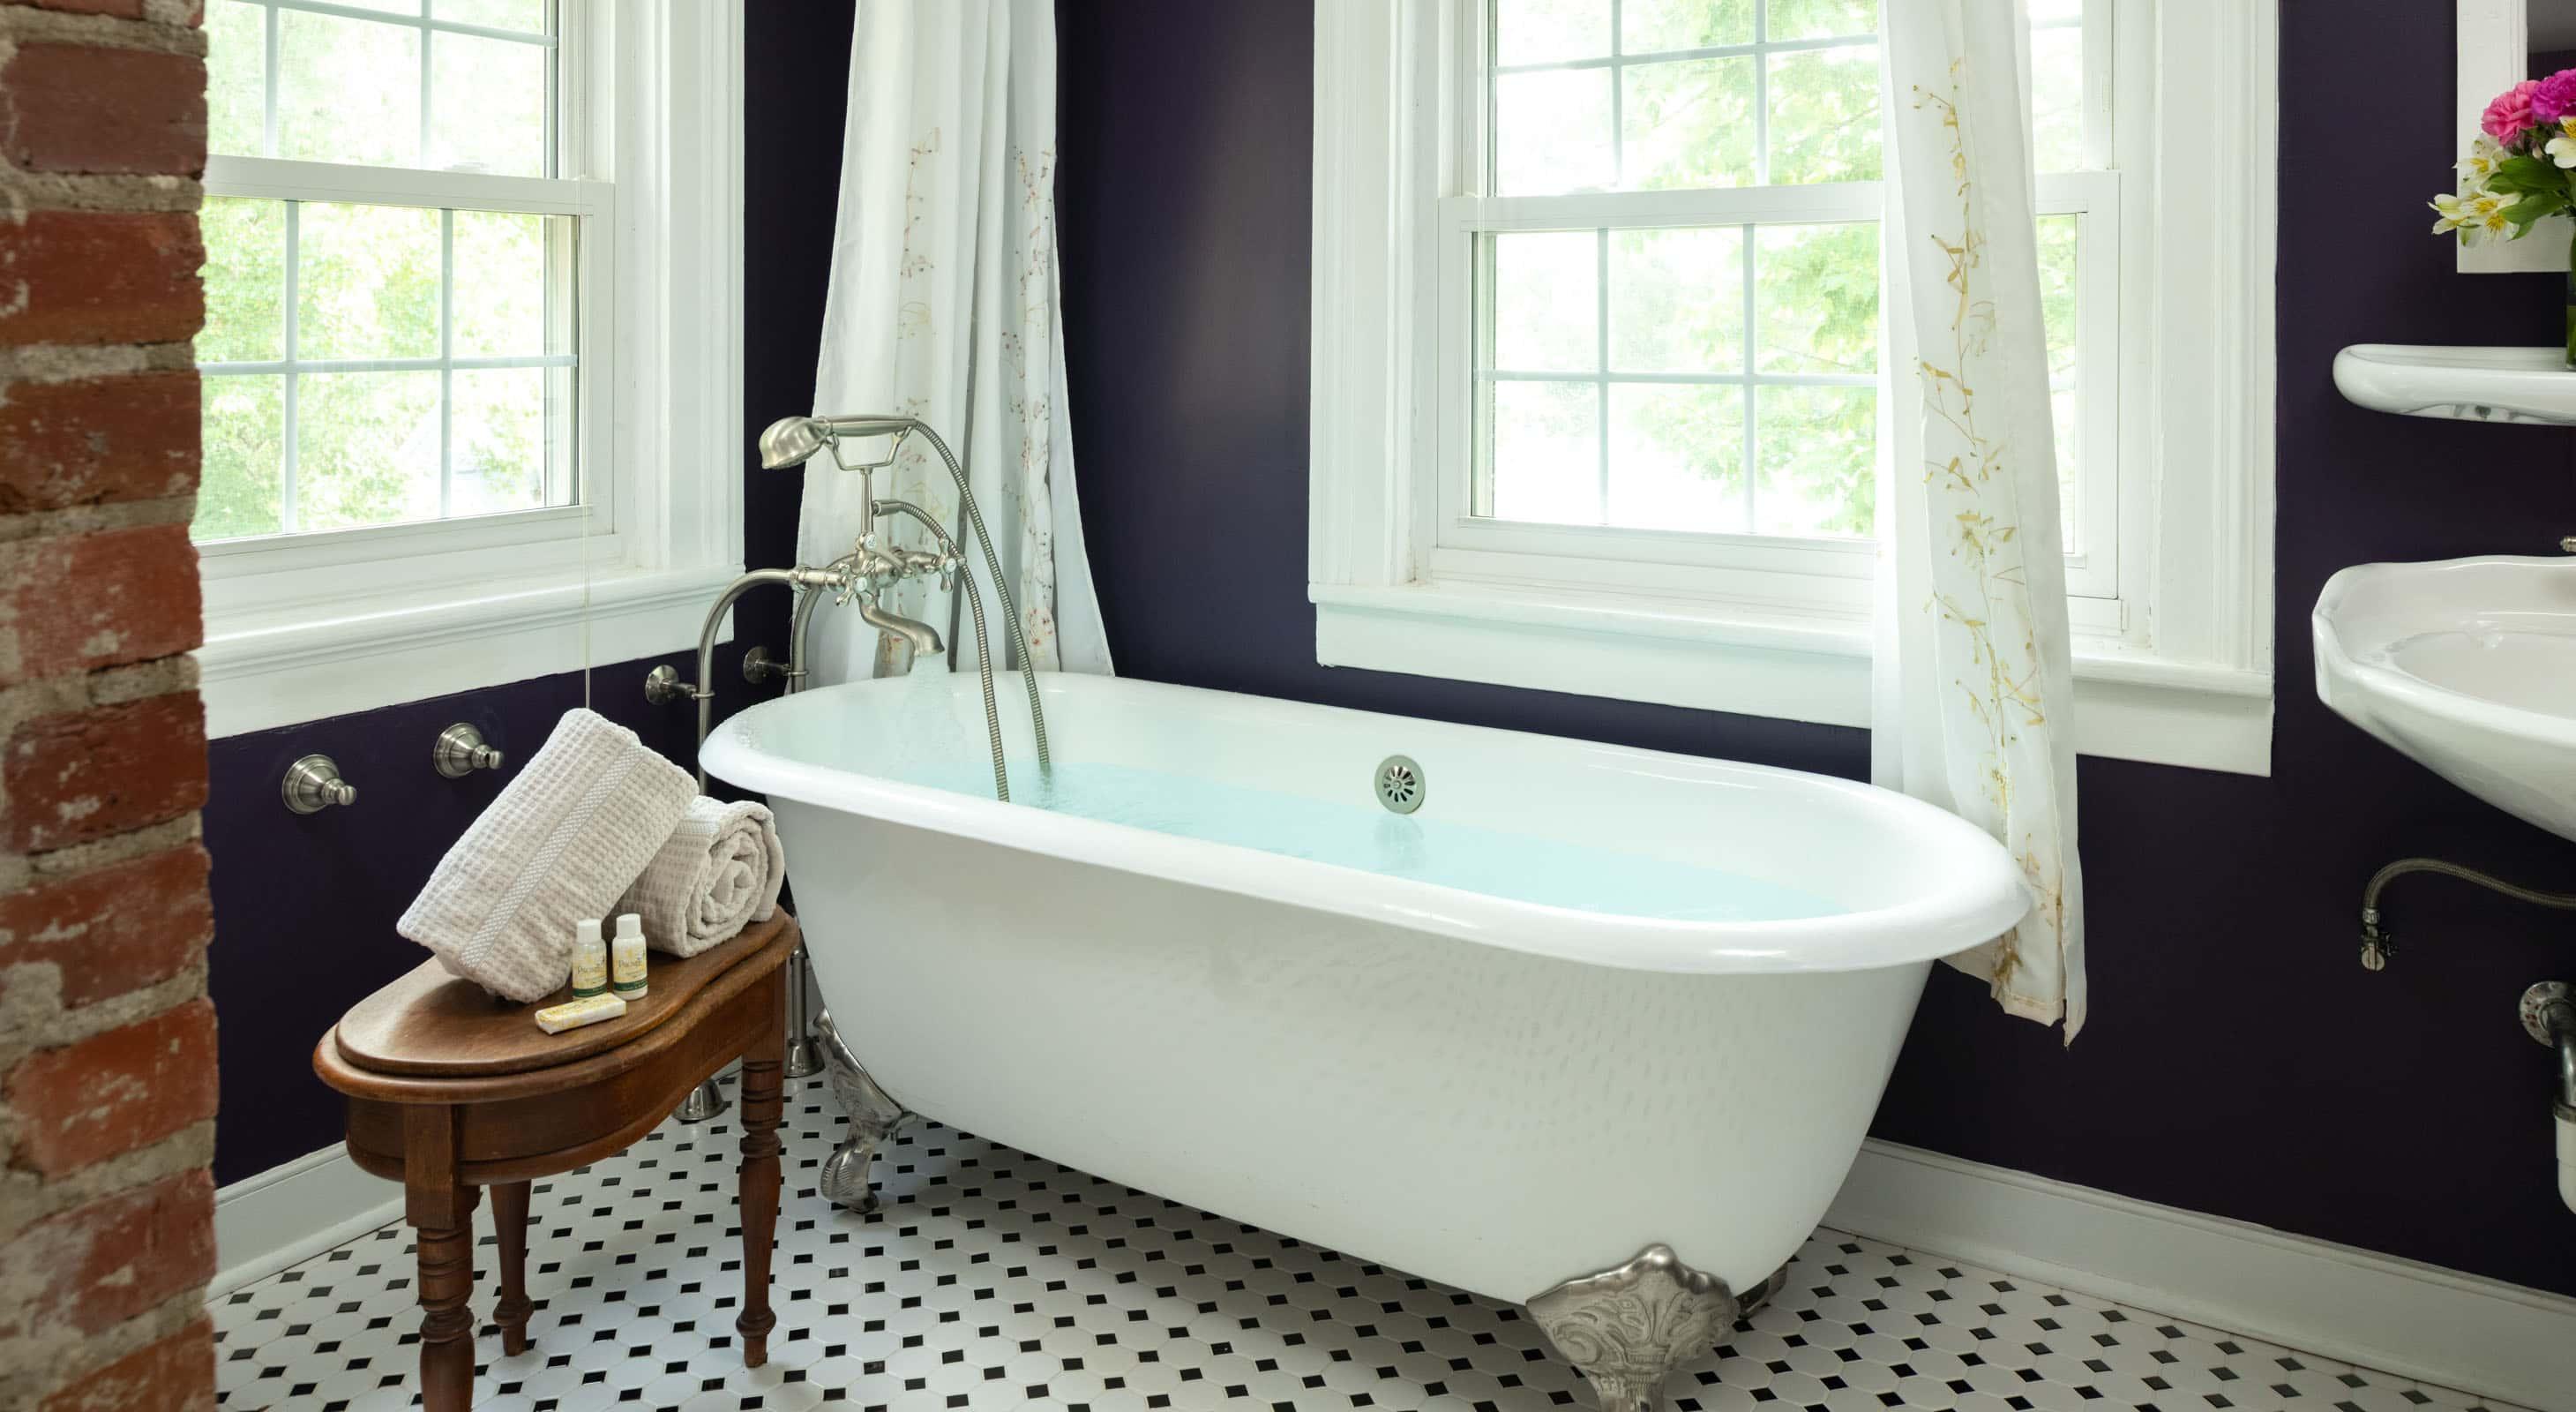 Clawfoot tub in a bathroom with garden views